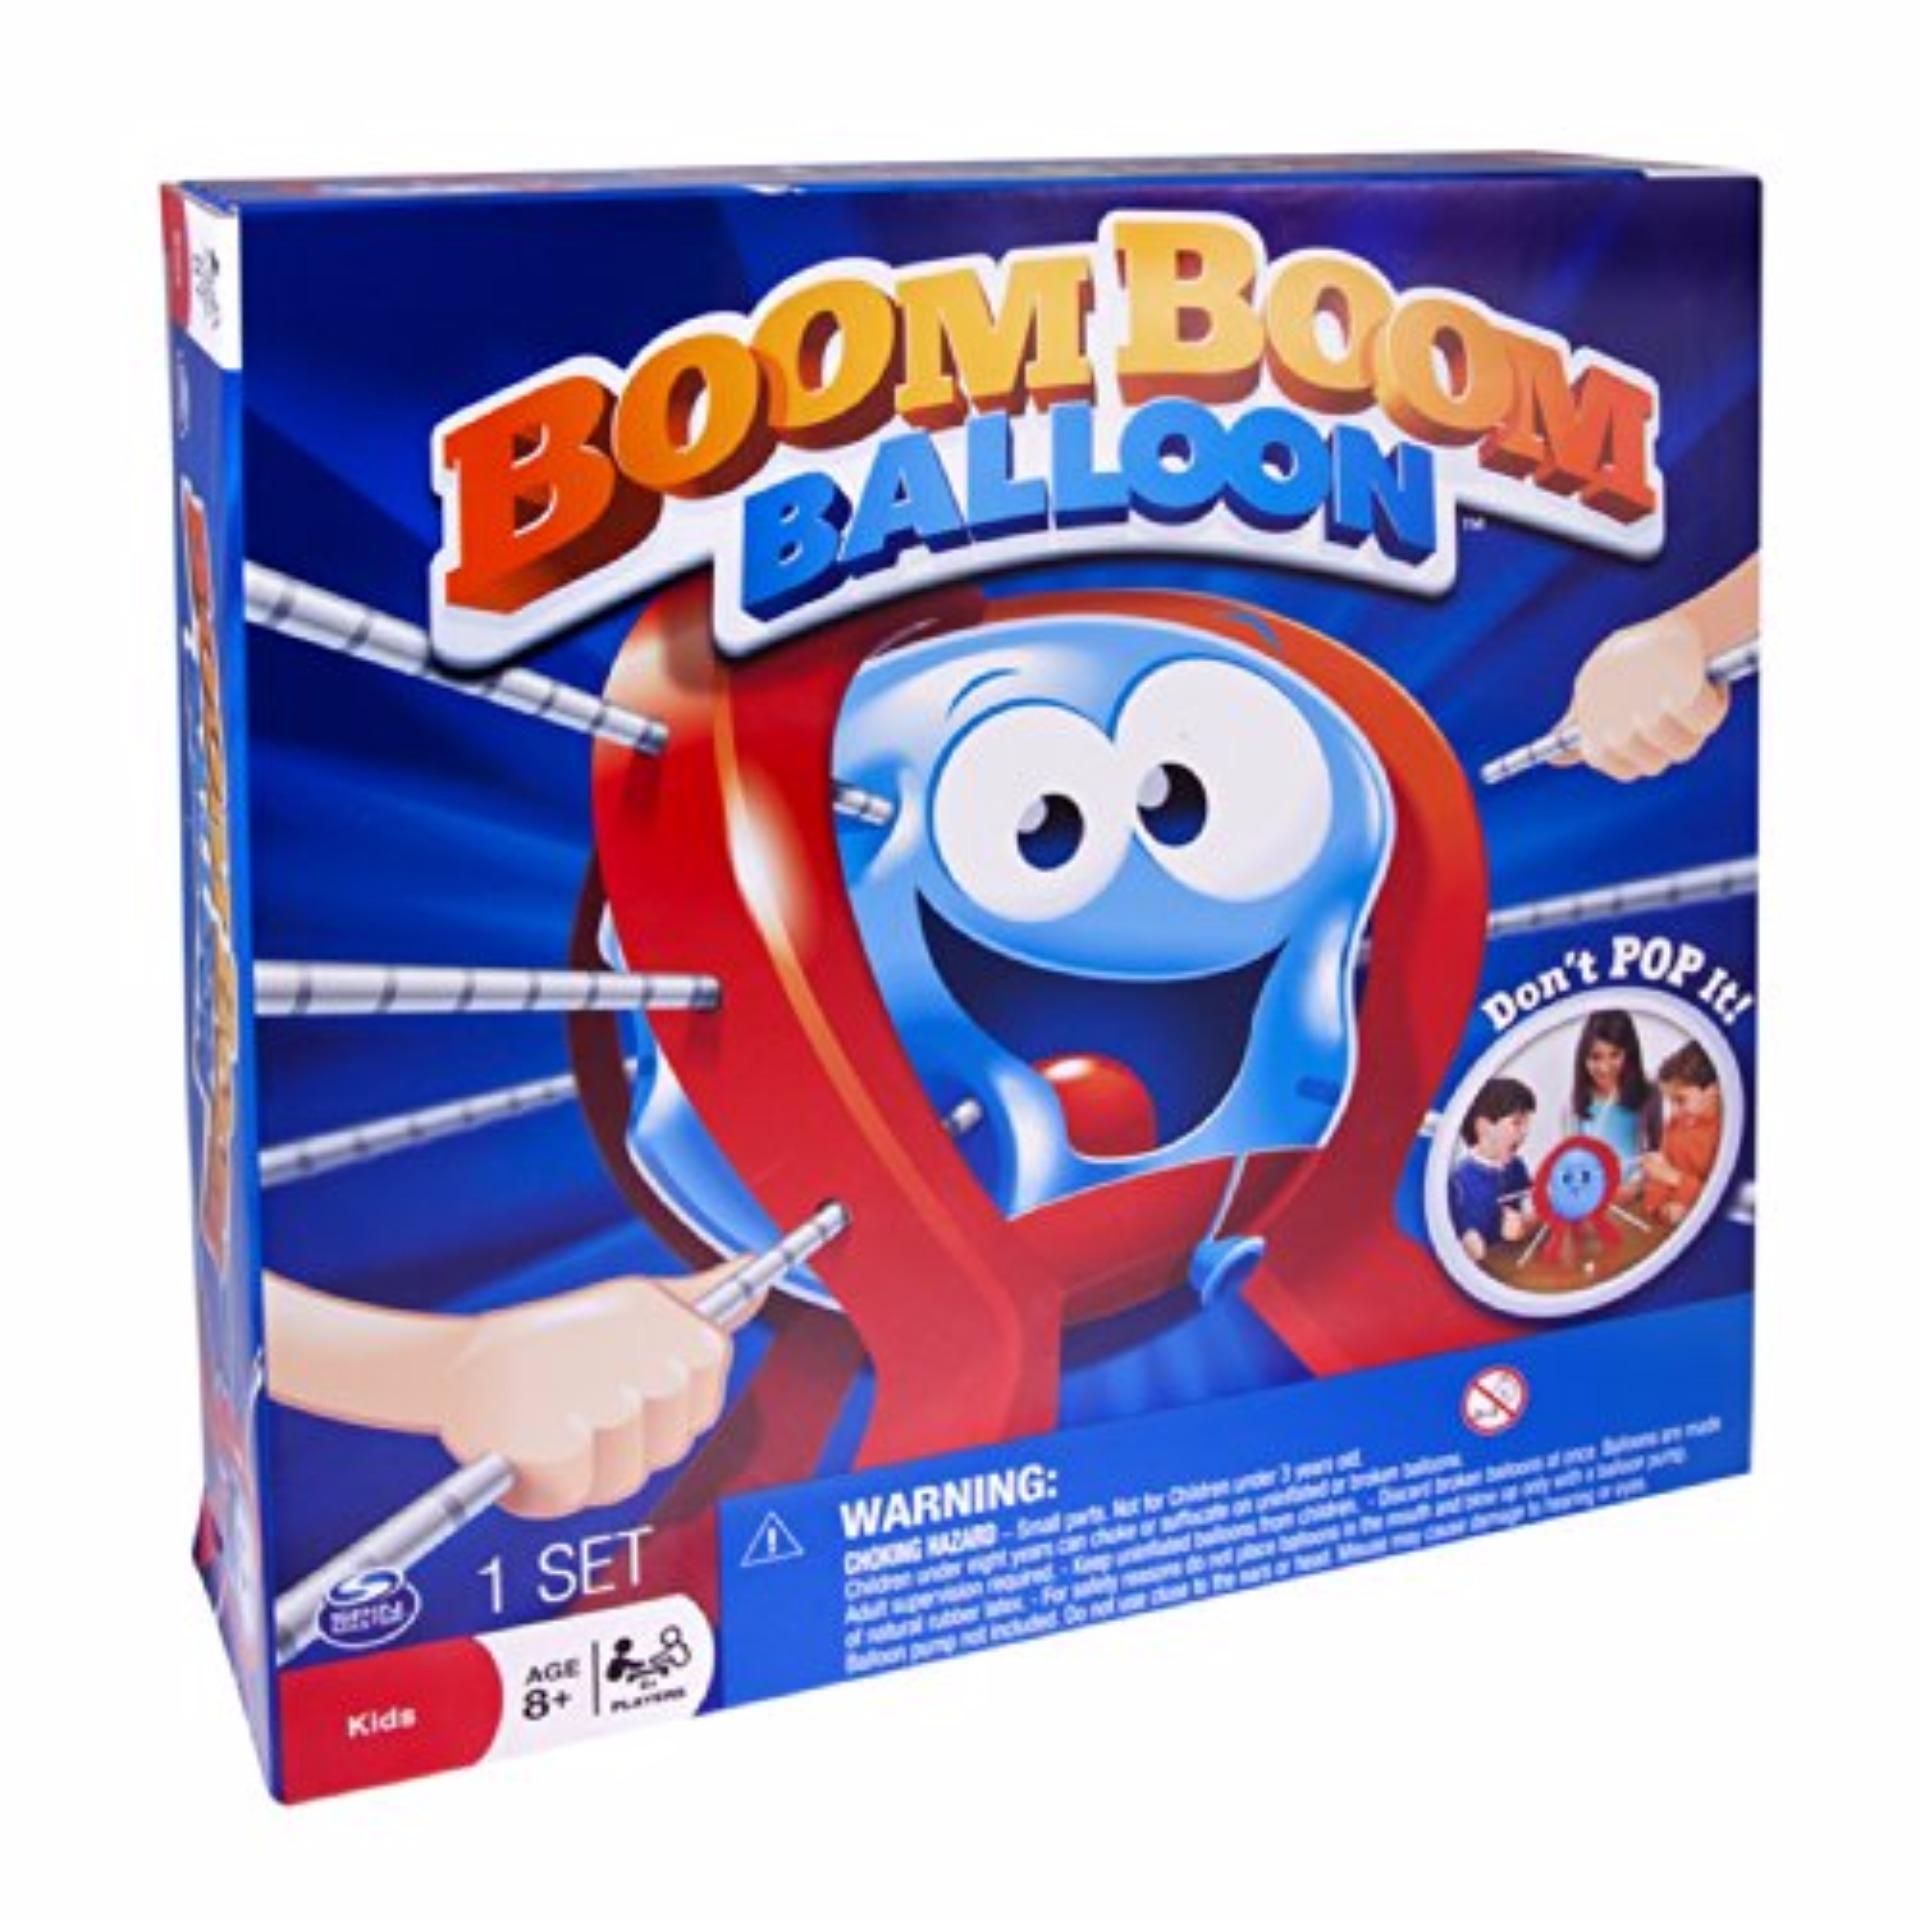 Promo Mainan Edukatif Melatih Motorik Anak Boom Boom Balloon Mainan Anak